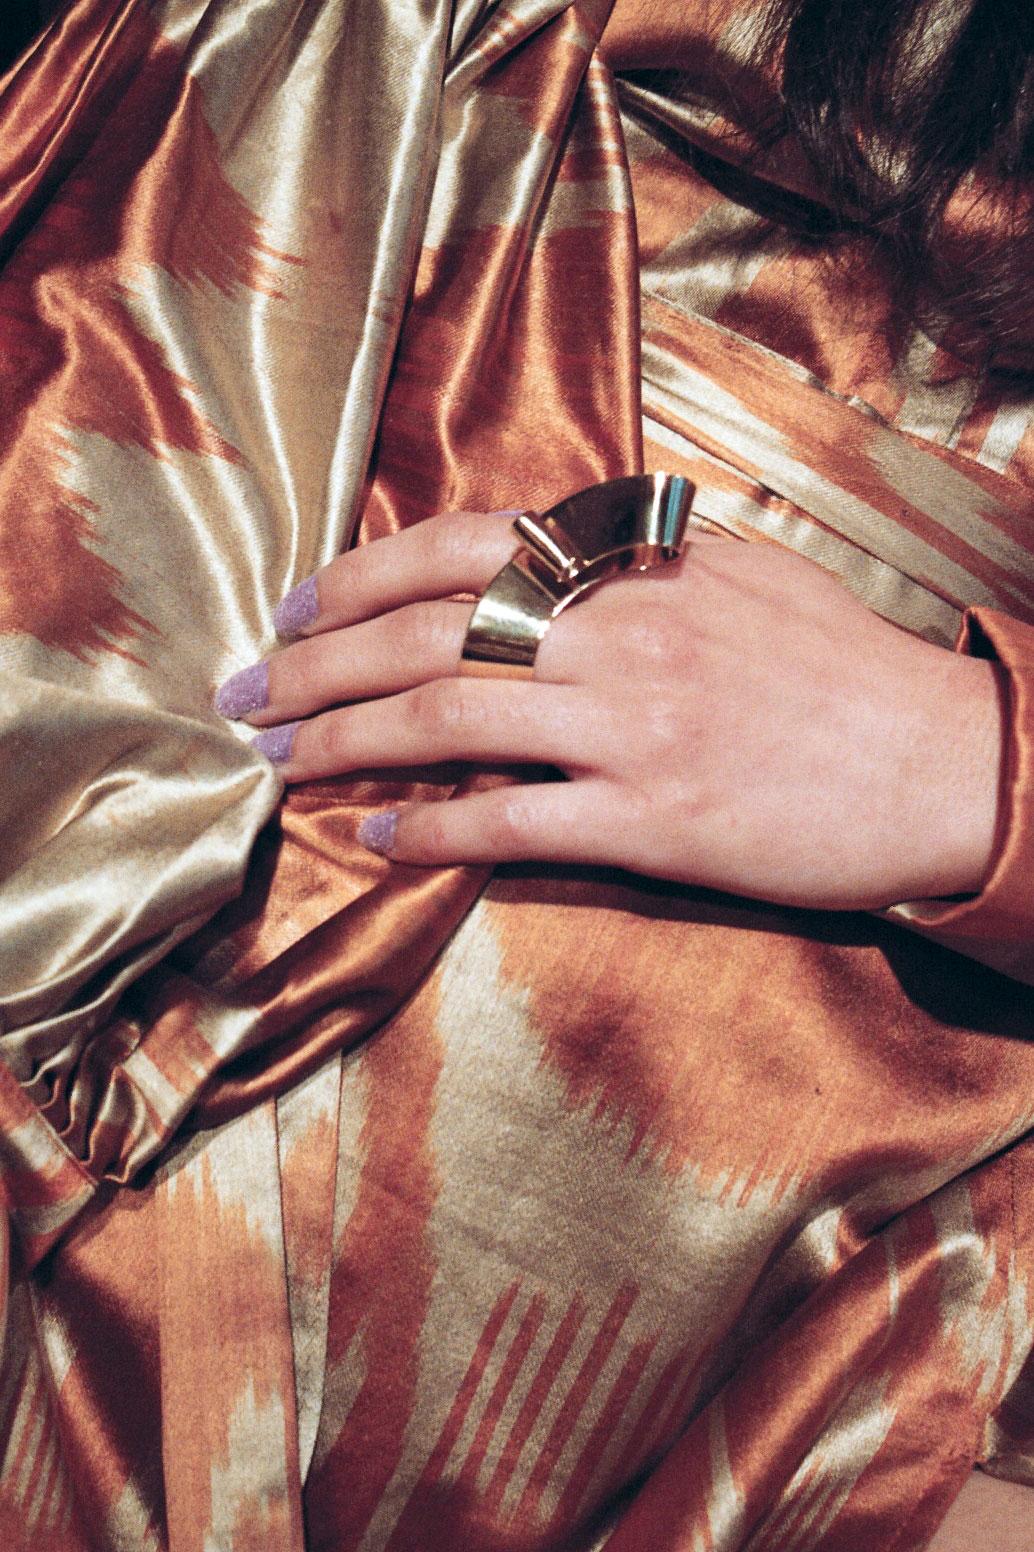 Kaltblut - Exclusive womensware editorial. Par Jeremy Benkemoun